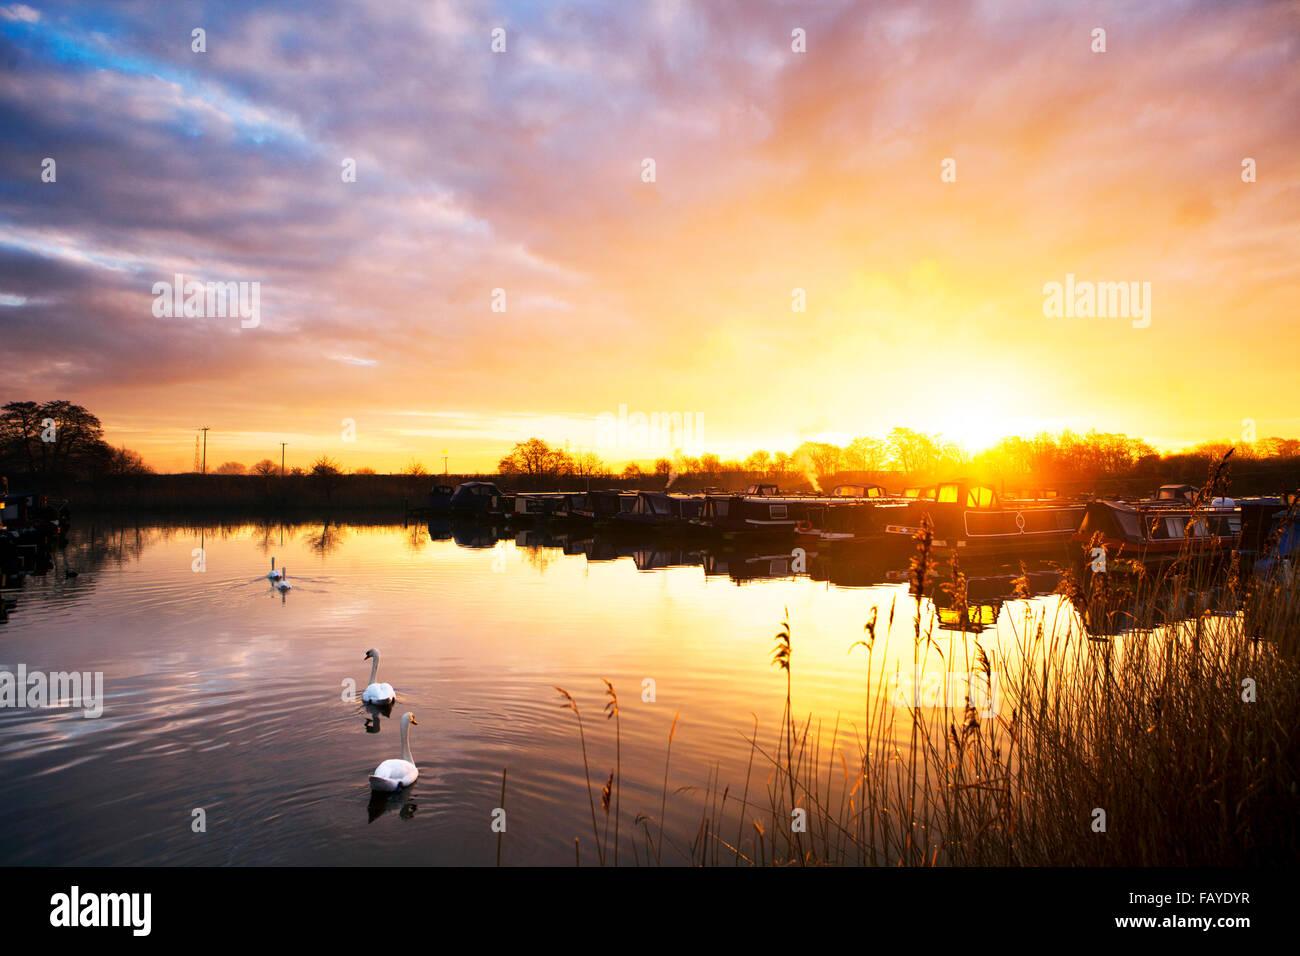 UK Weather 06 Jan 2016.  Sunrise over canal boats, Rufford, Lancashire, UK.  The soft amber glow of the sunrise Stock Photo